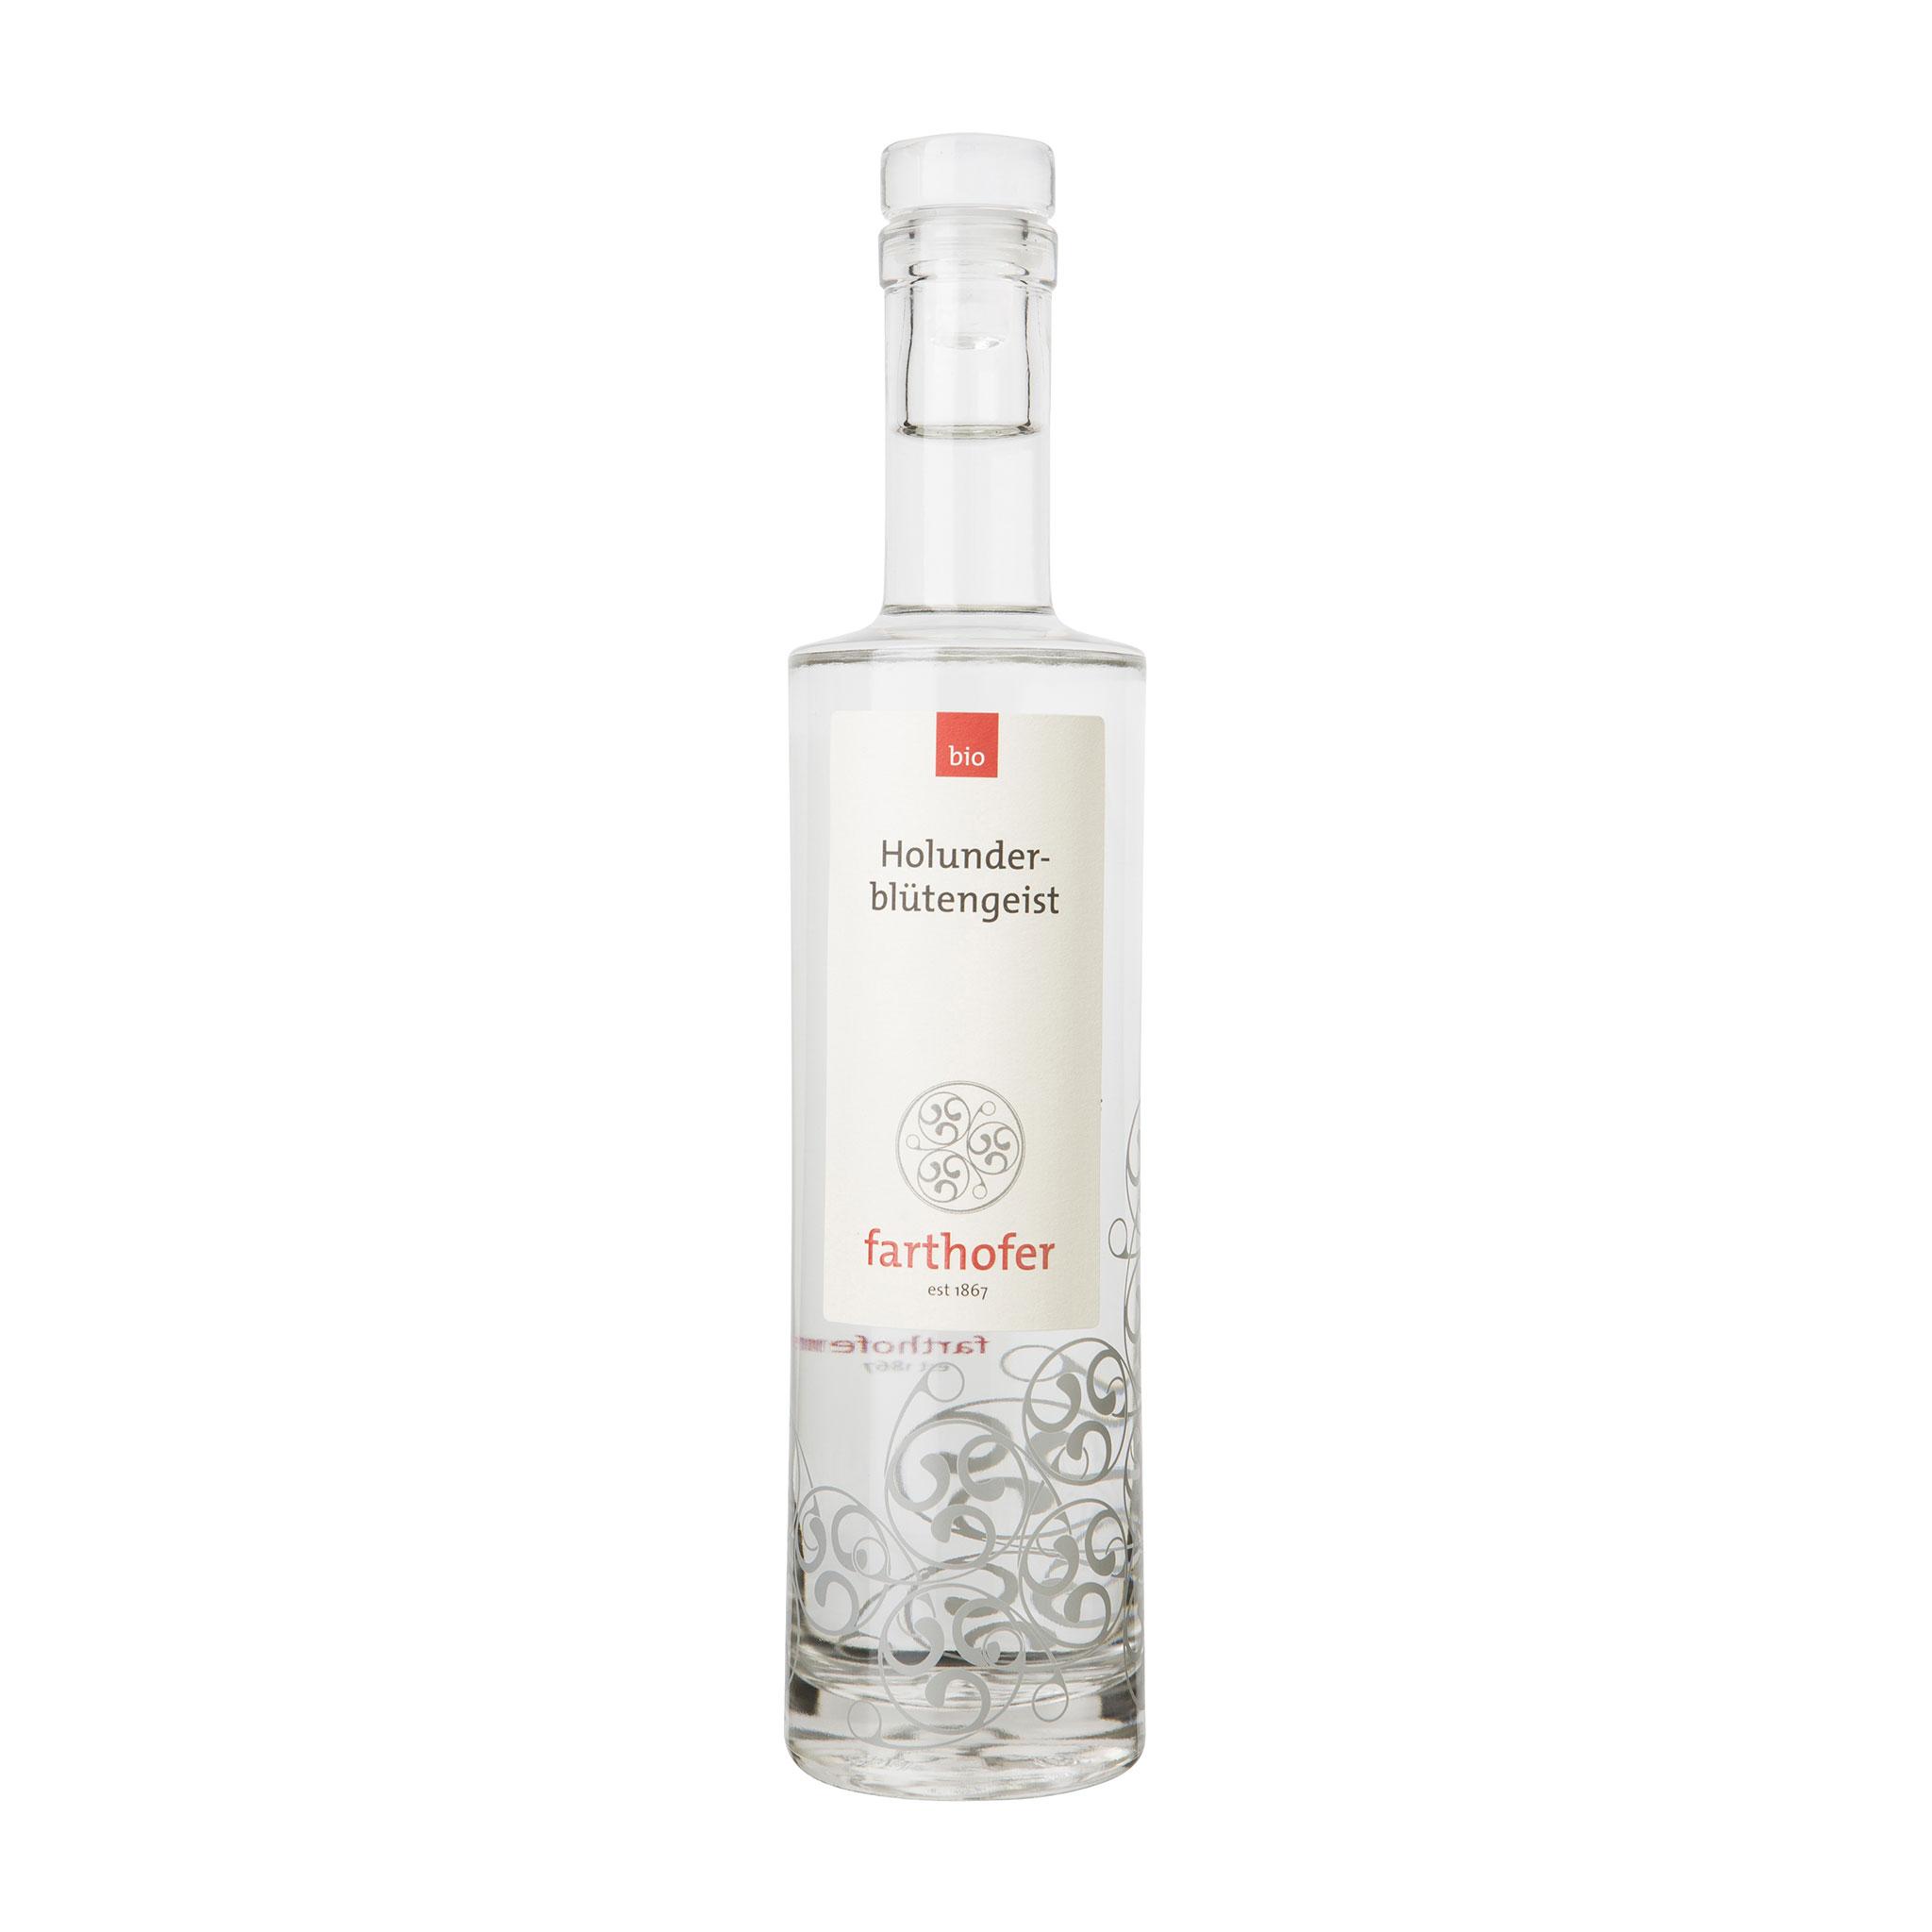 Bio Holunderblütengeist (700 ml)